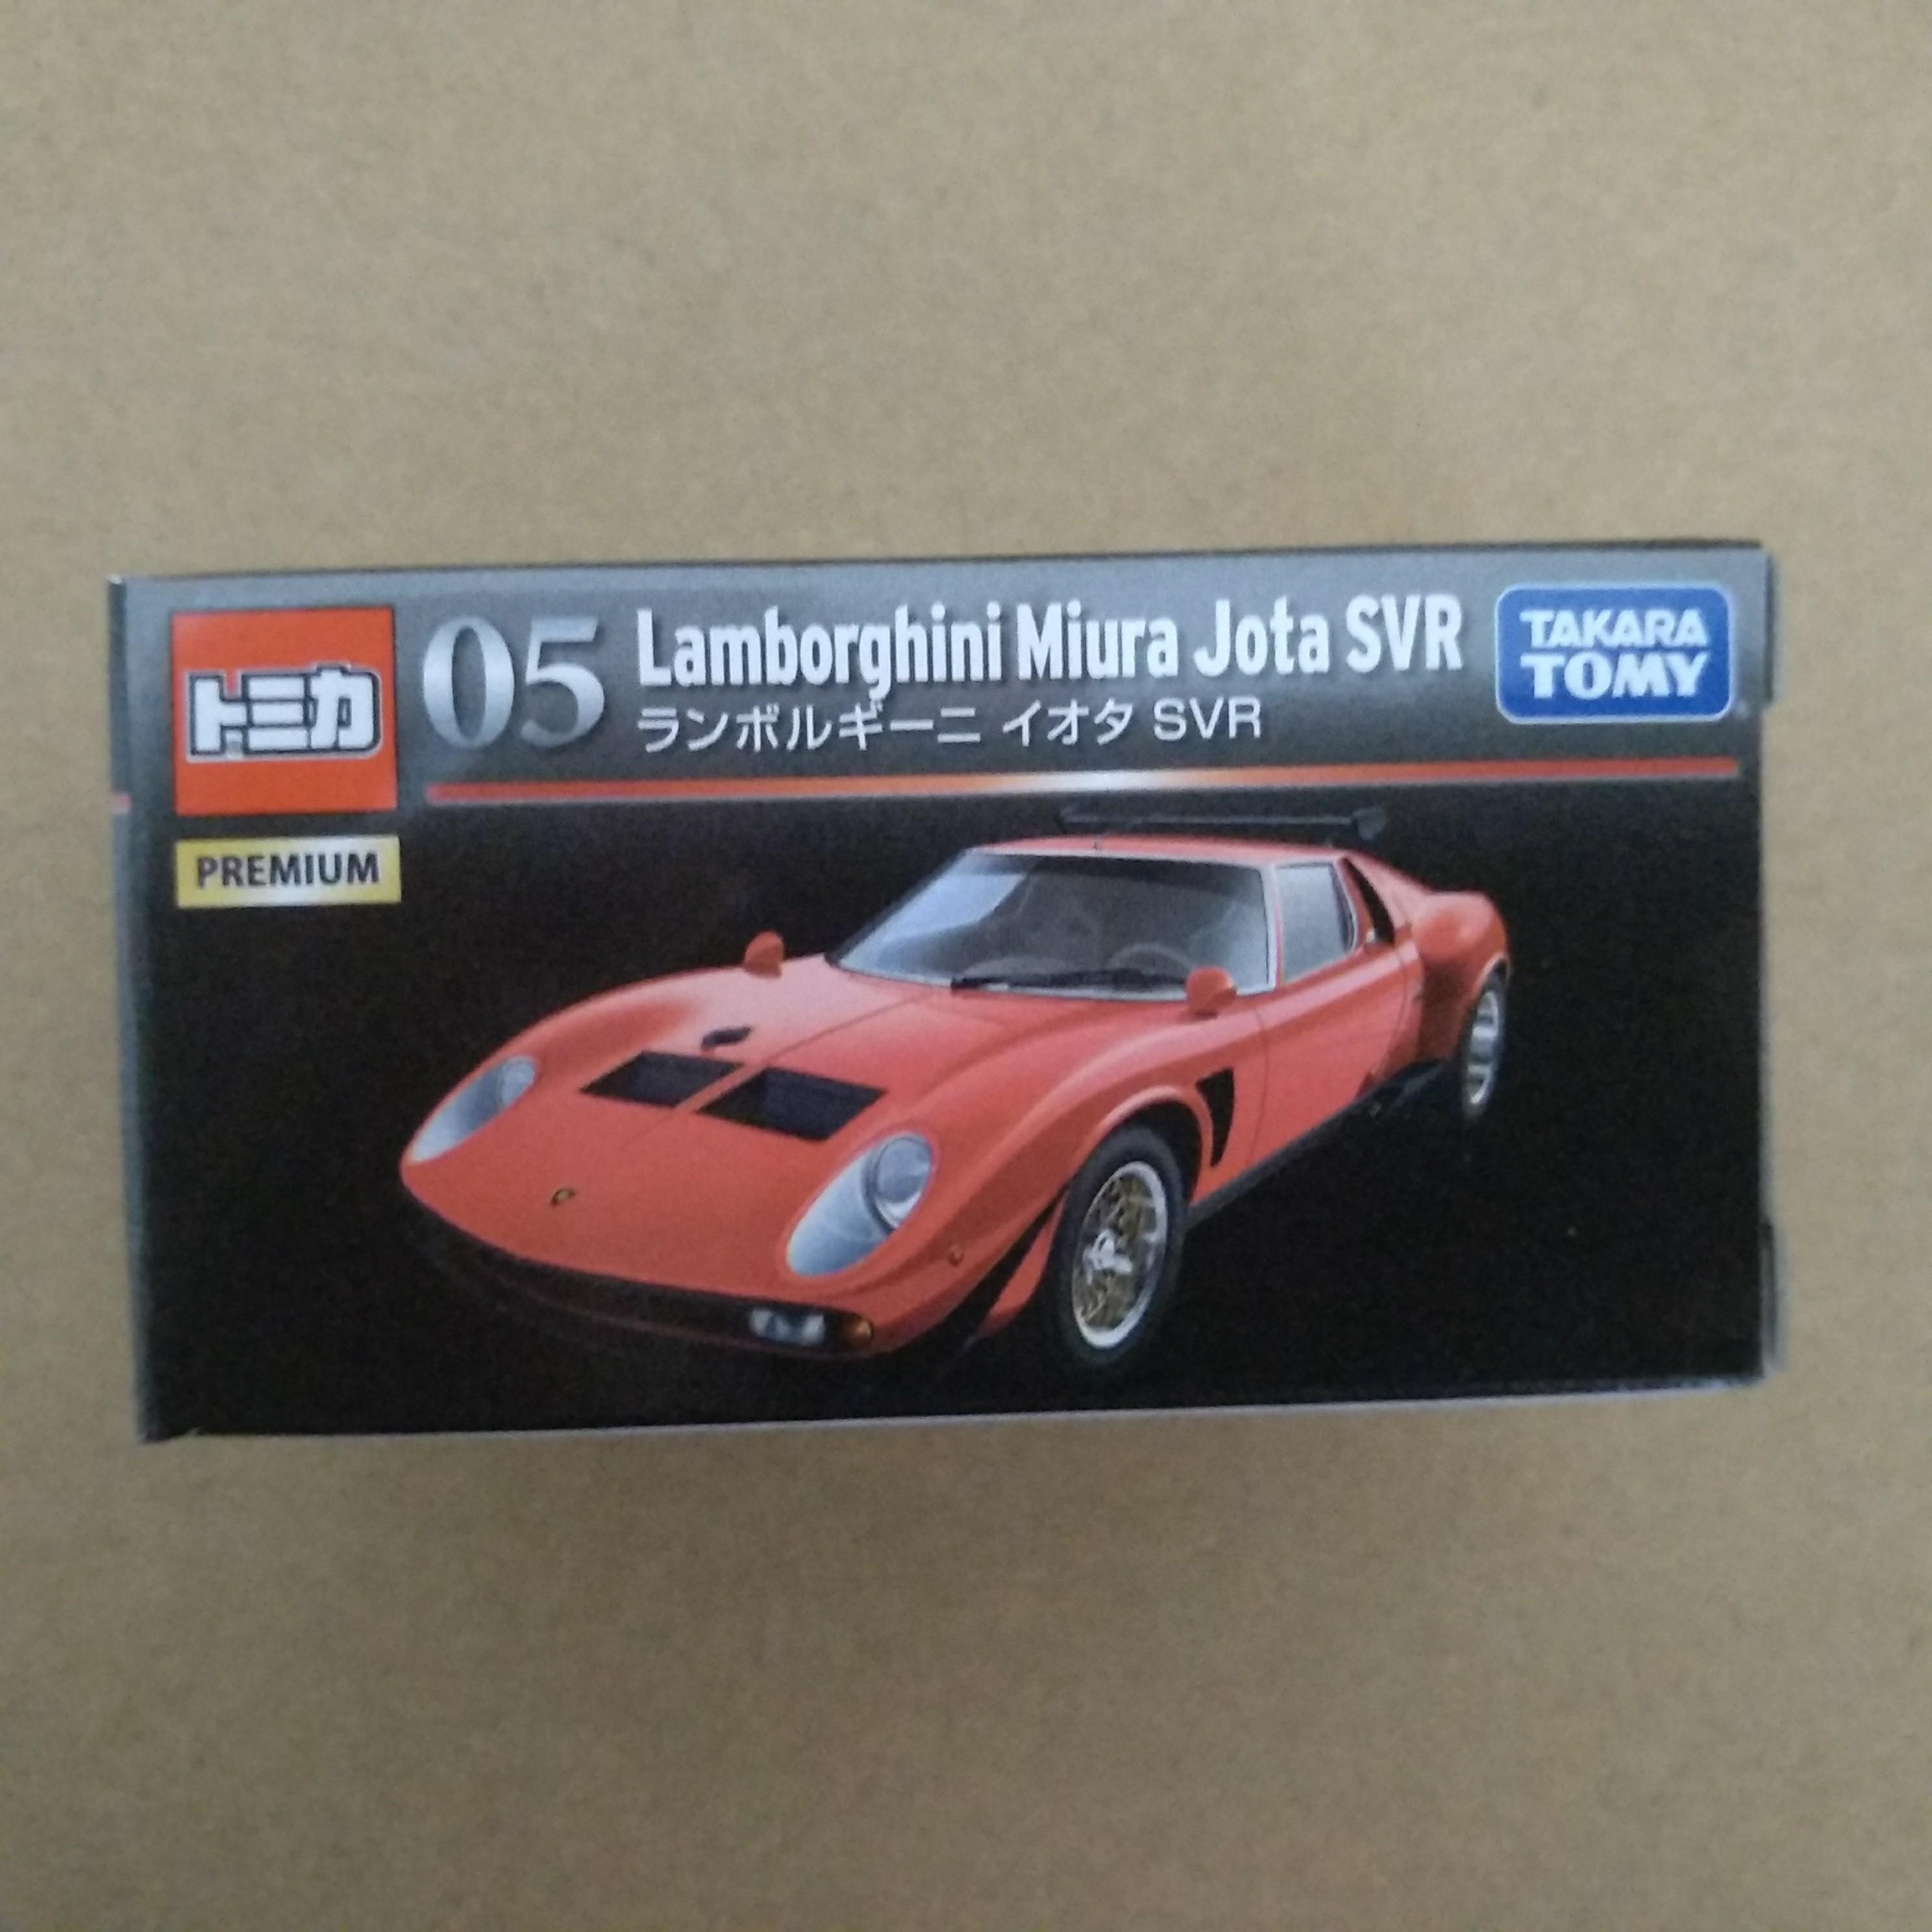 Takara Tomy Tomica Premium 05 Lamborghini Miura JOTA IOTA SVR